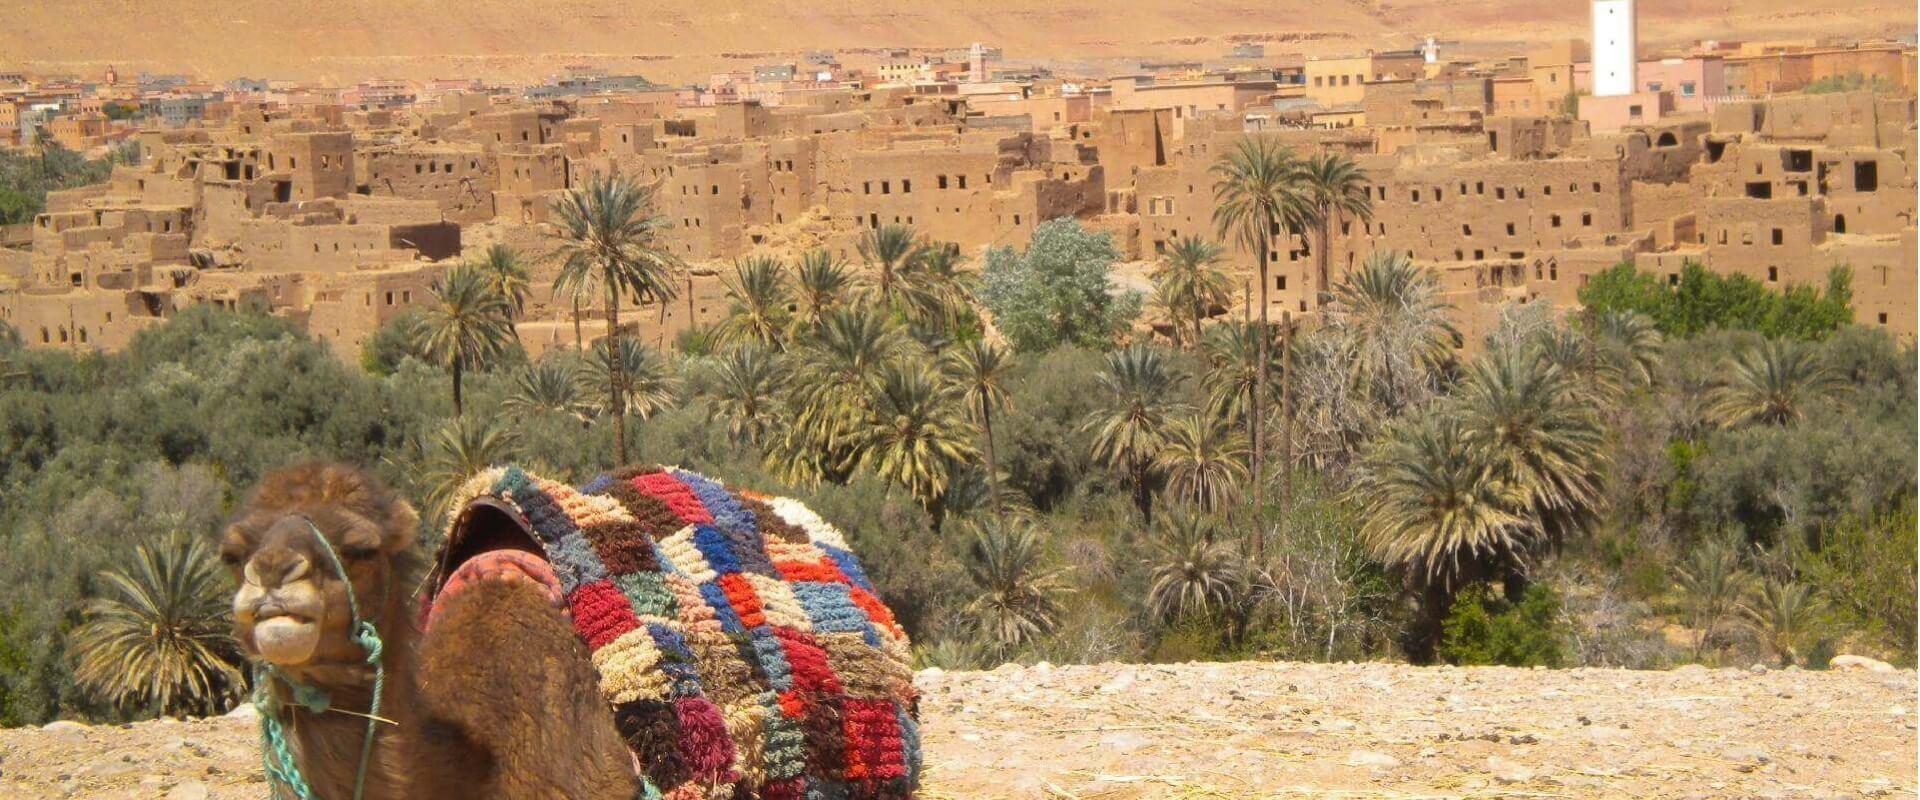 The Morocco Sensation Motorcycle Tour